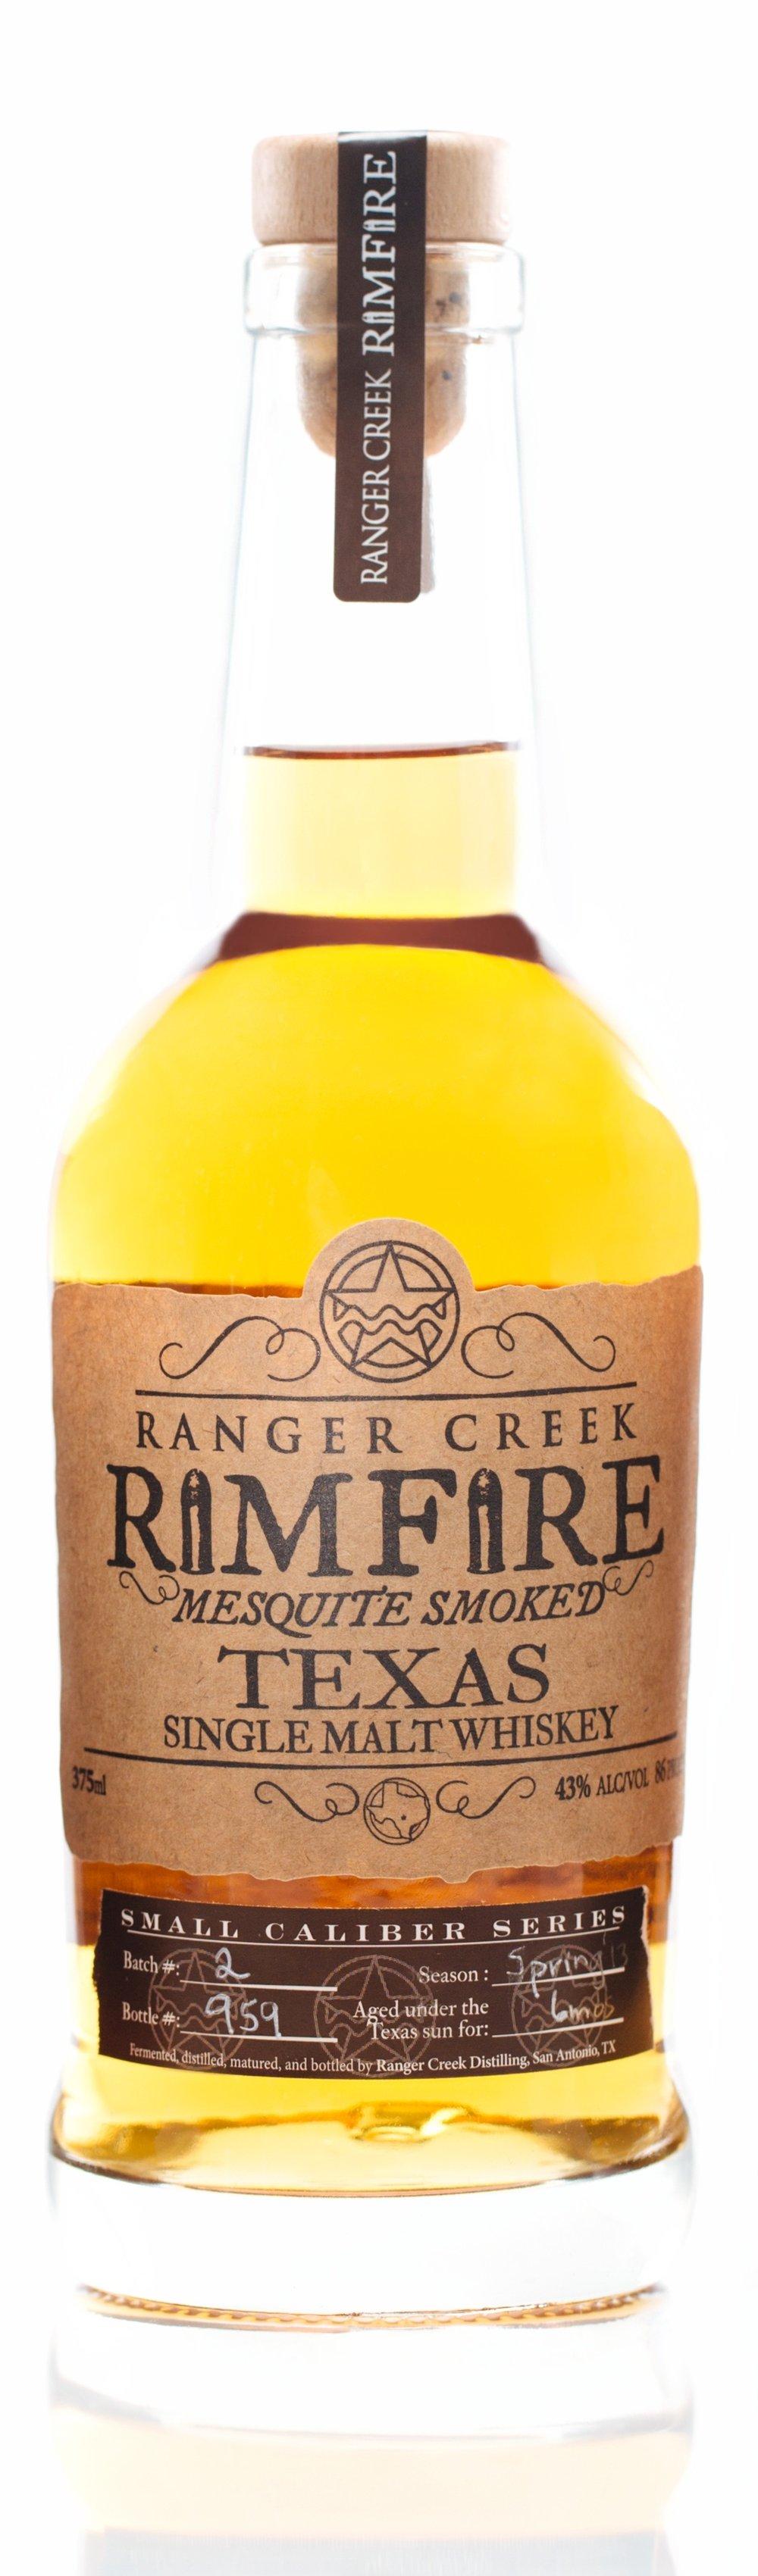 Rimfire Bottle